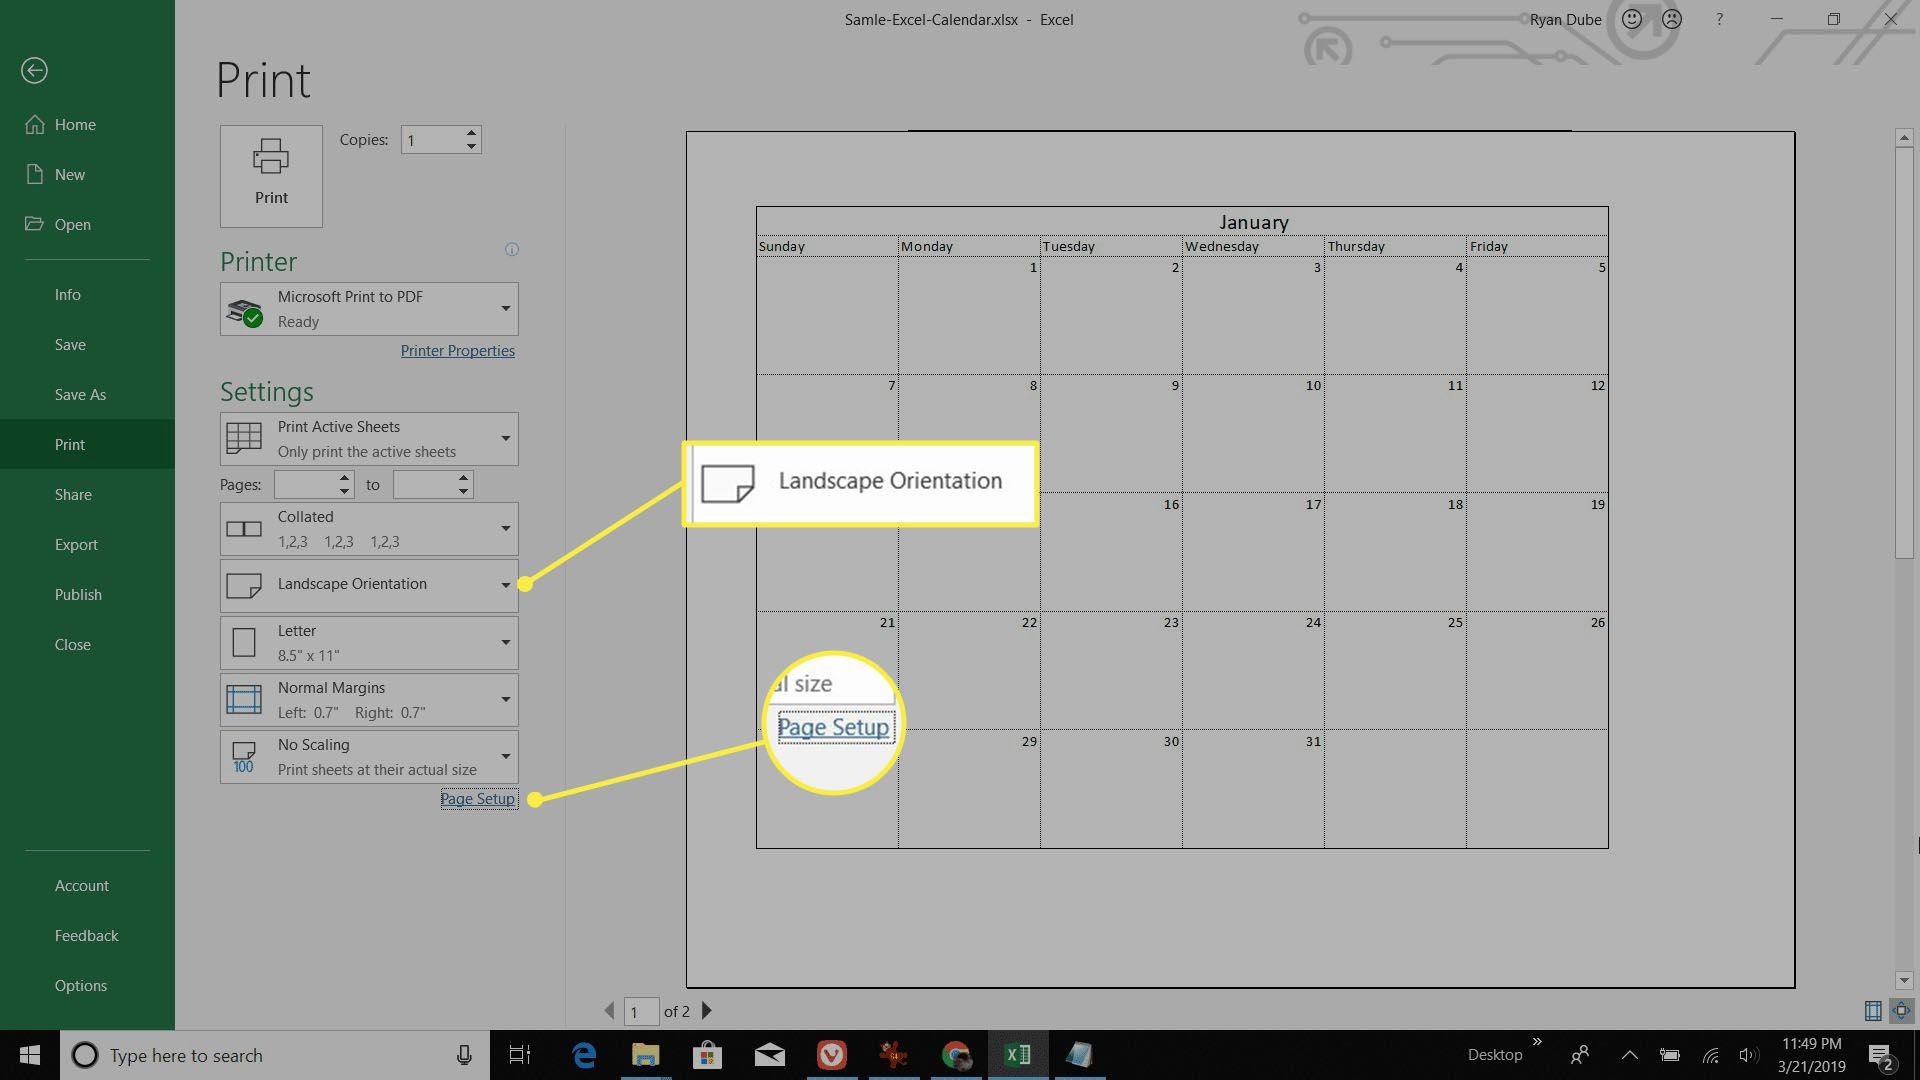 printing a monthly calendar sheet